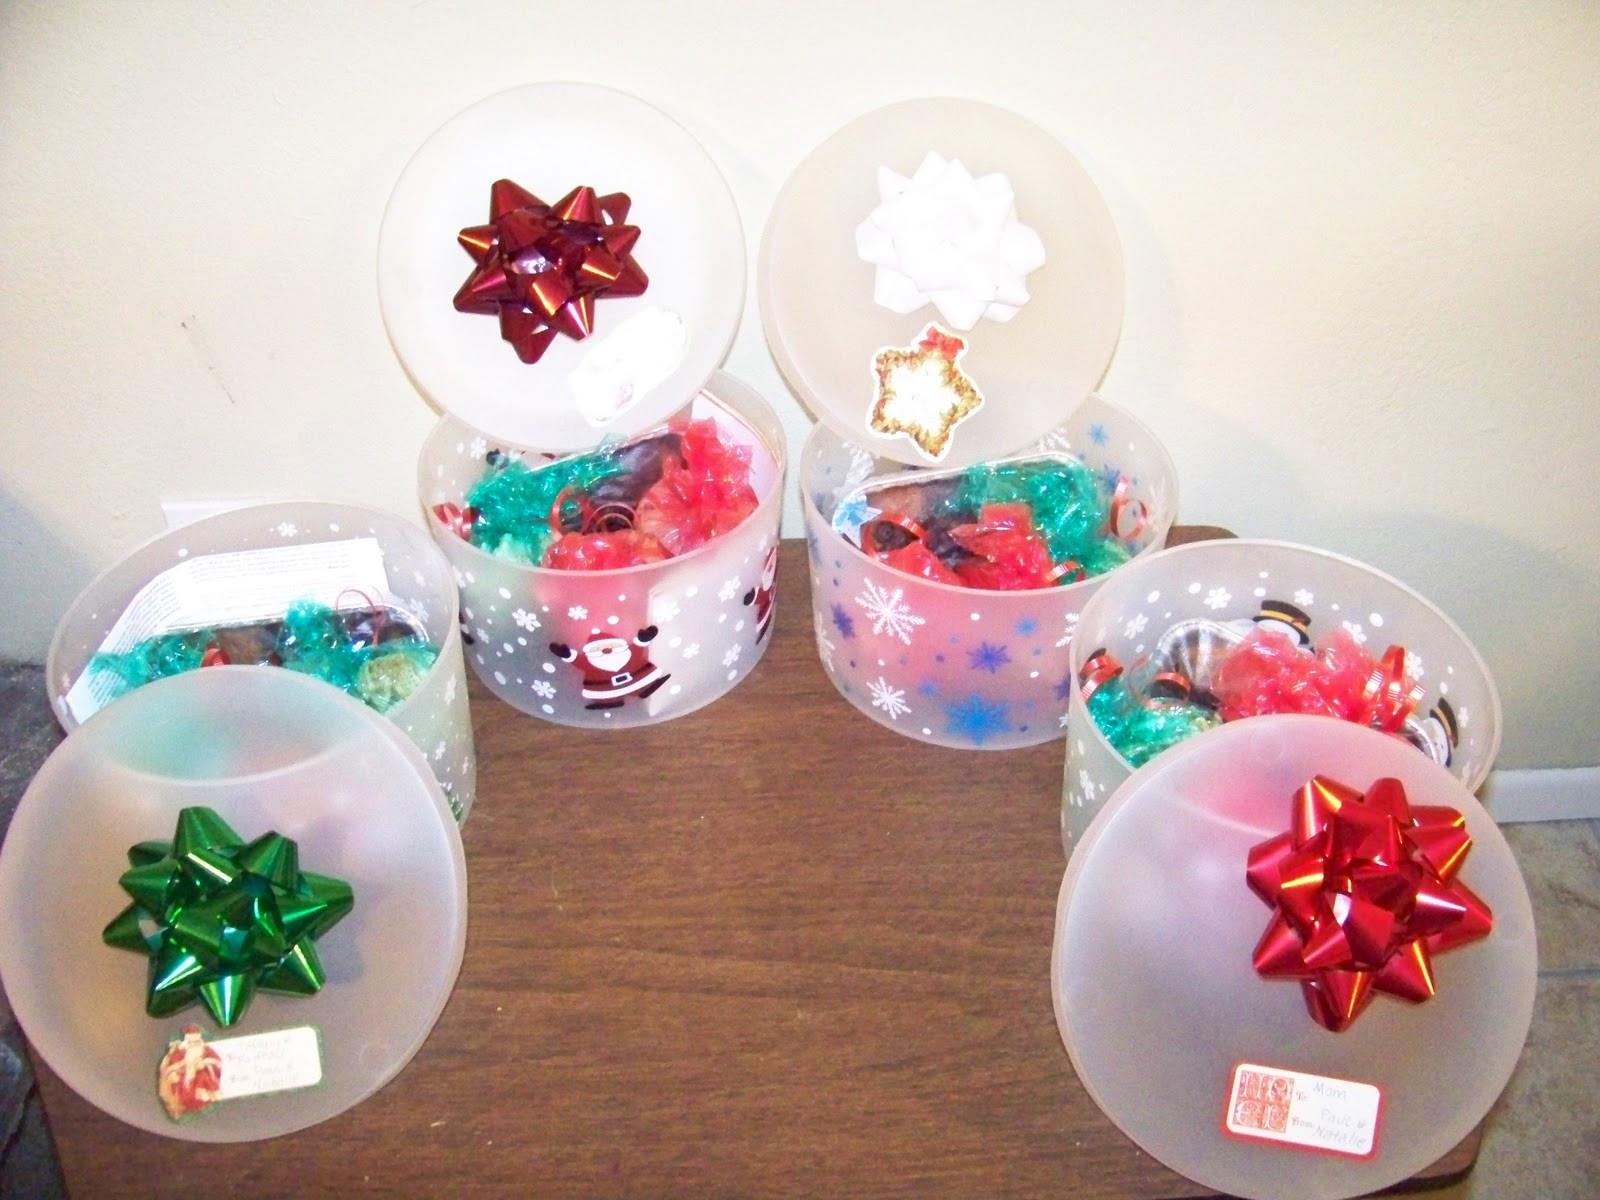 Baking Gifts For Christmas  Locate Utah Homes Homemade Baked Goo s Christmas Gift